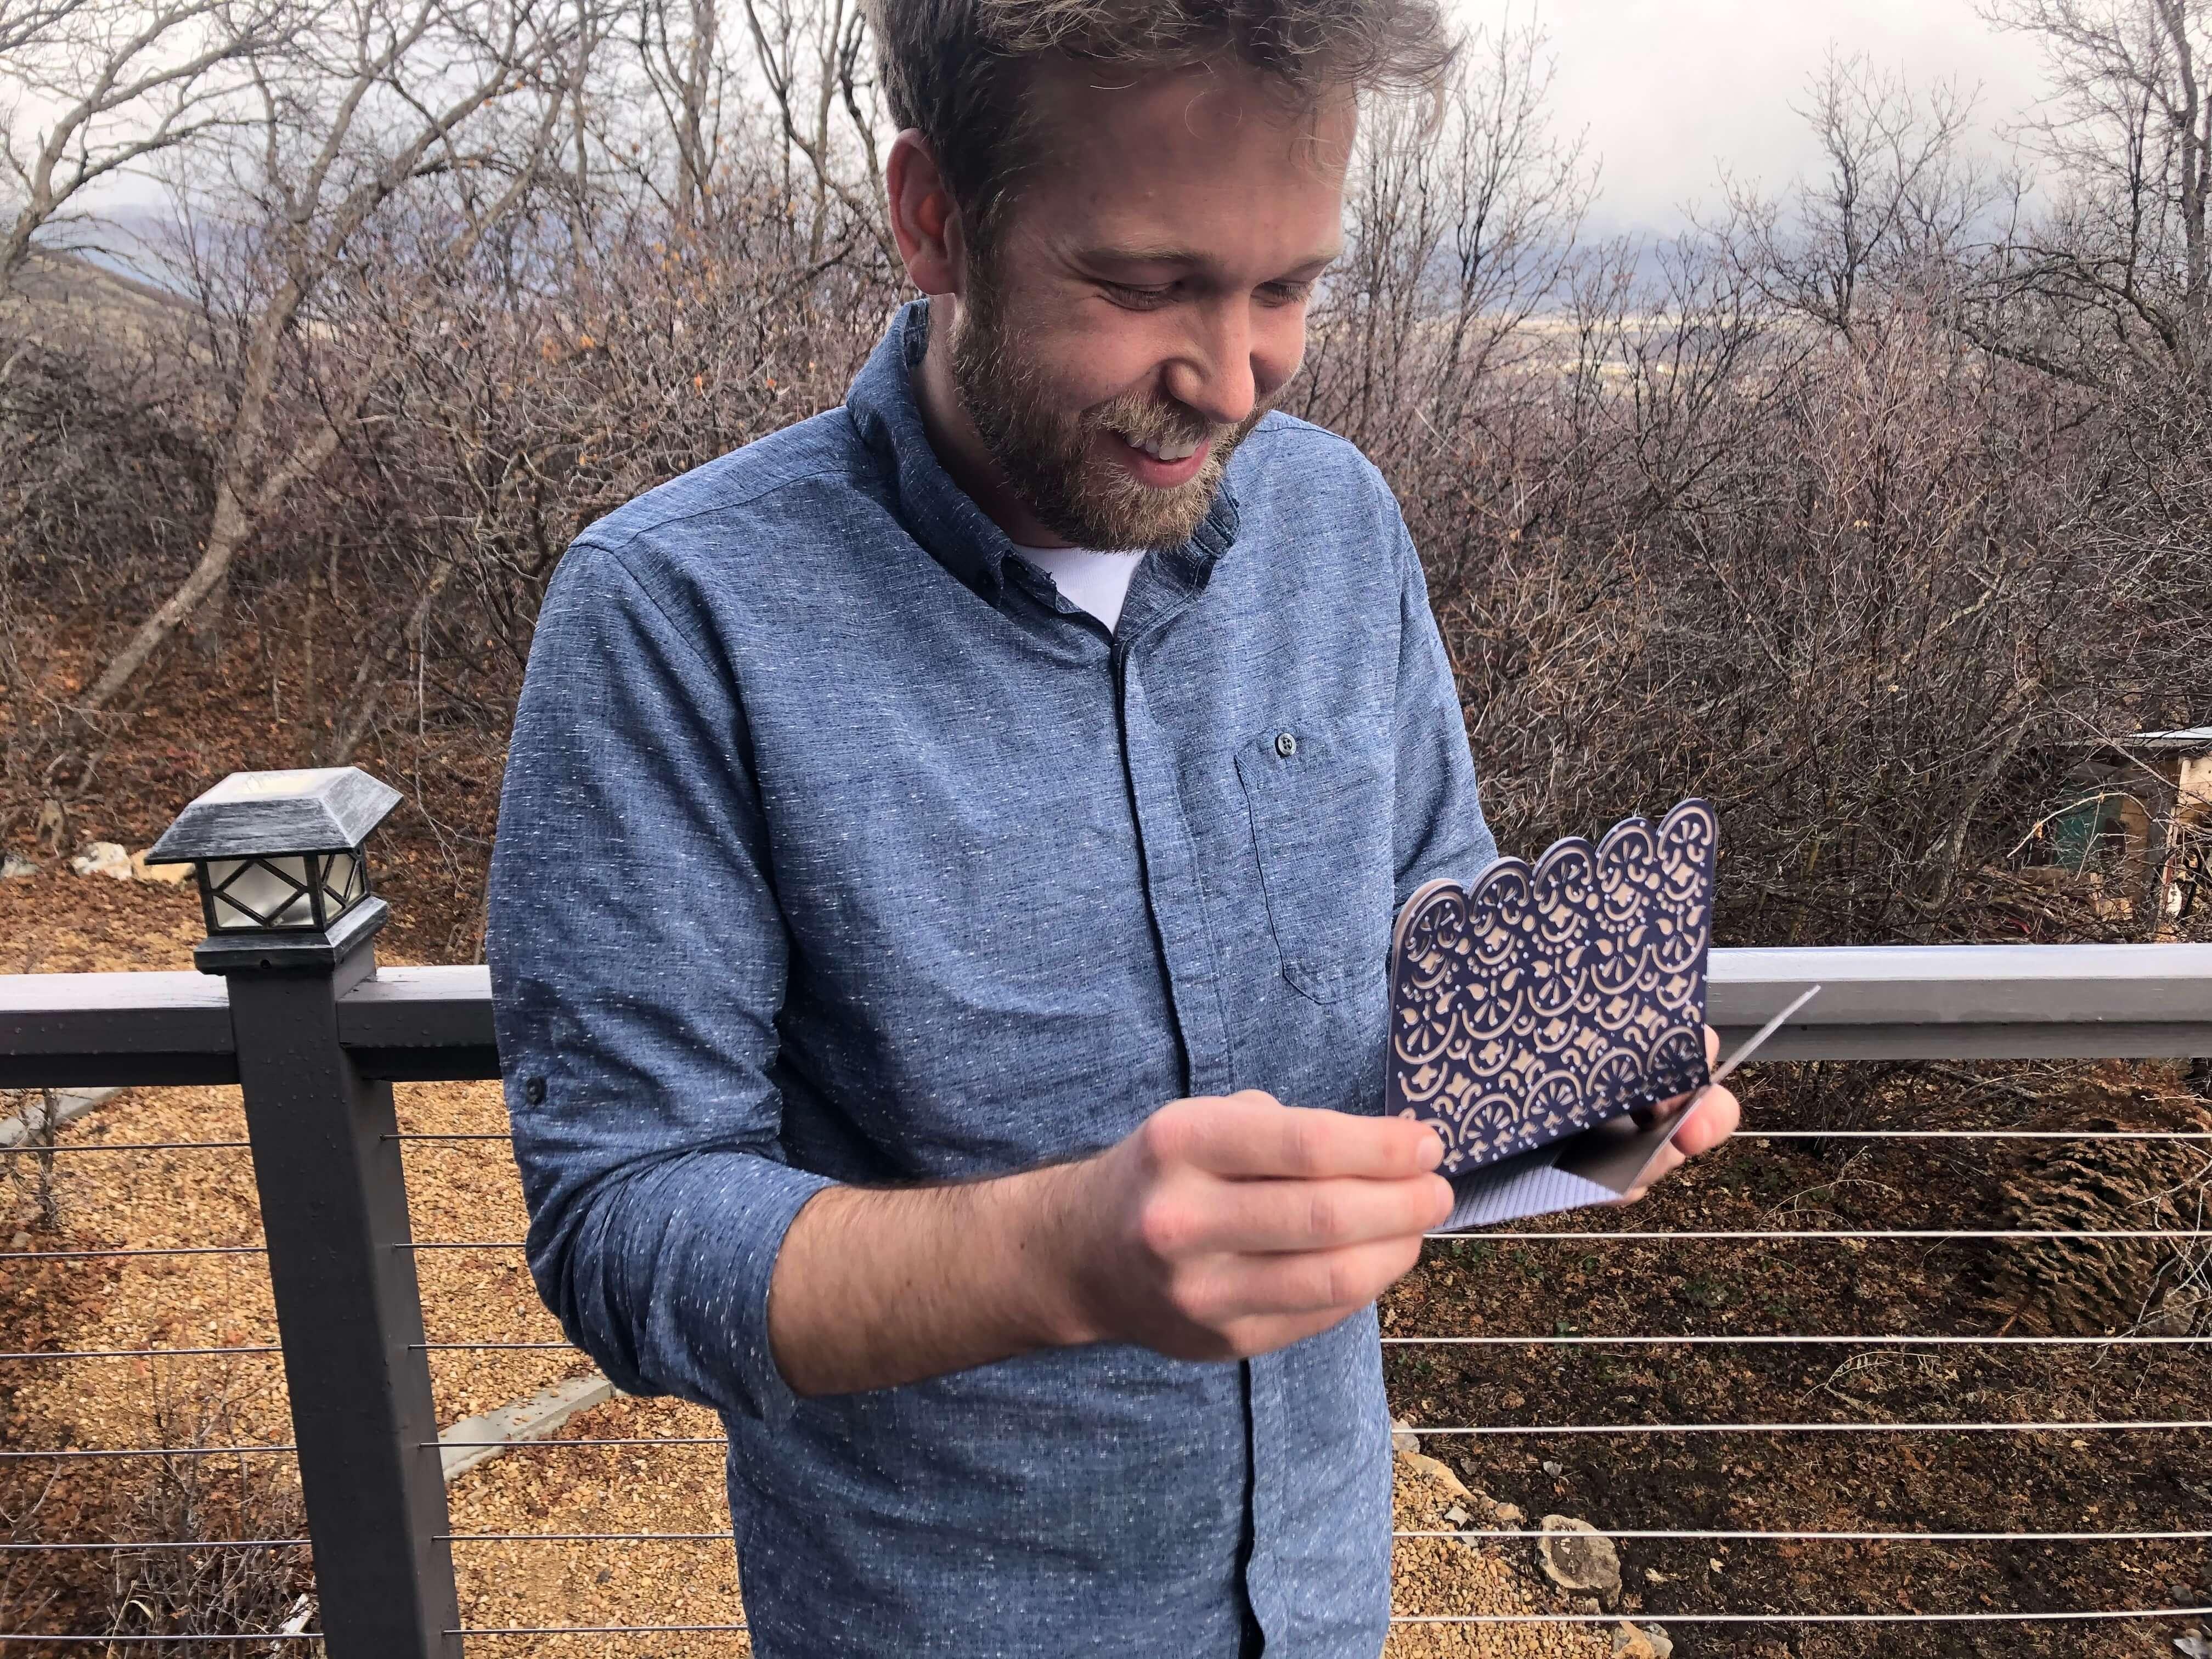 Make a Card